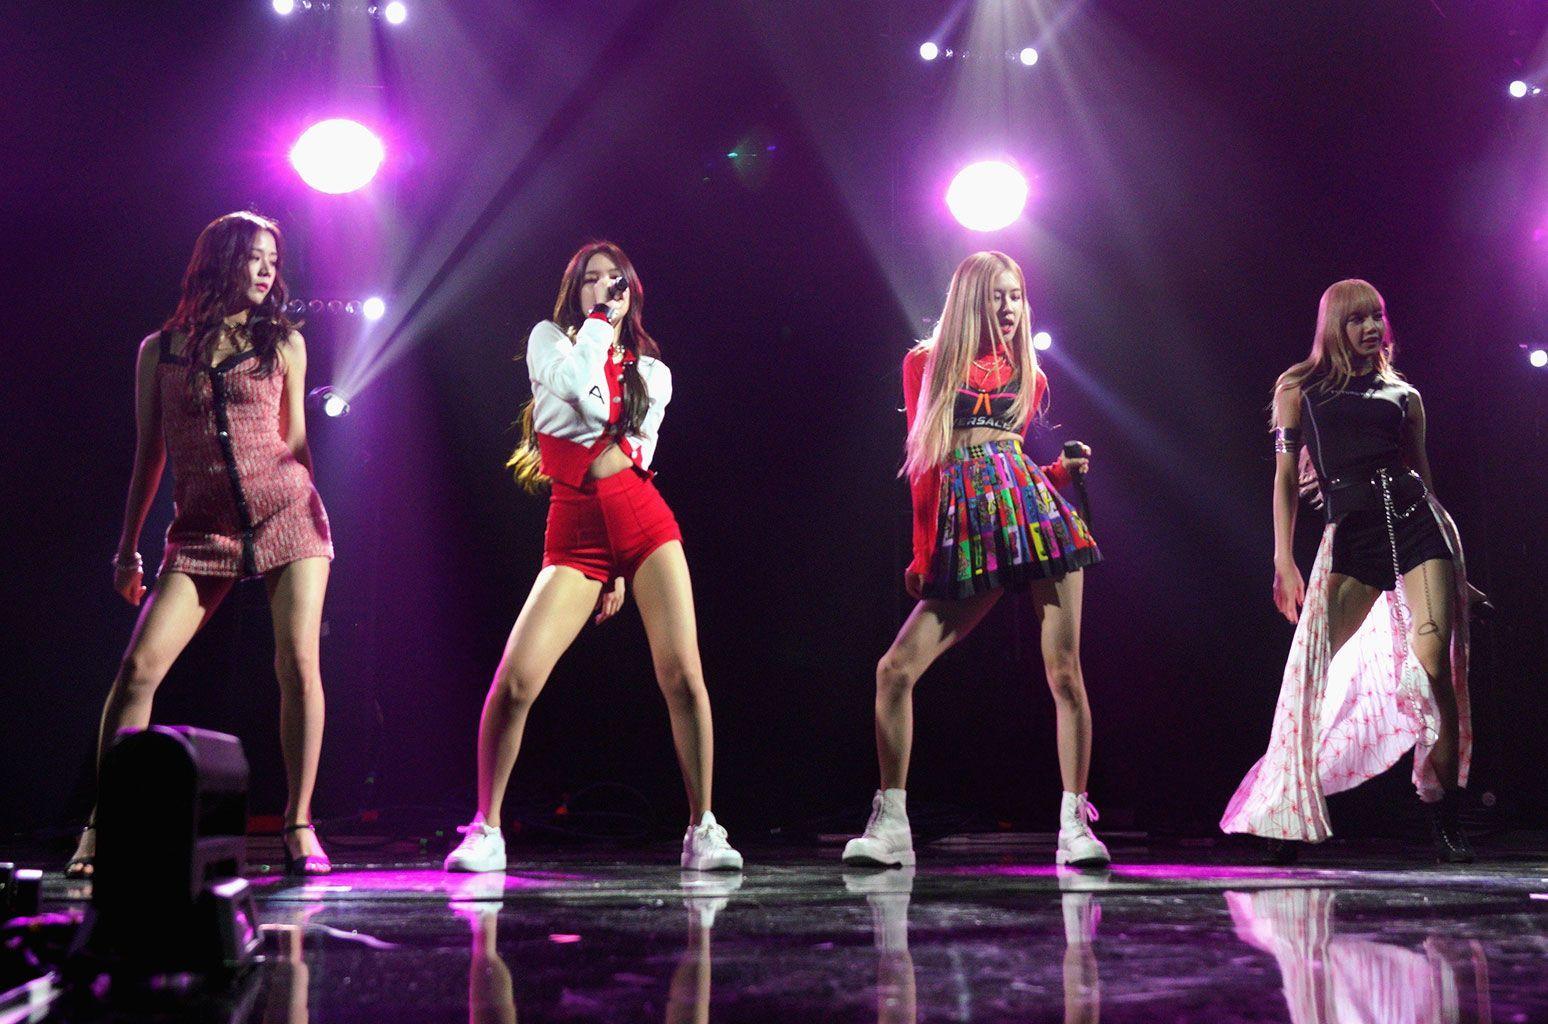 Bukan Hanya BTS, 3 Musisi Kpop Ini Ikut Ramaikan Grammy Awards 2019